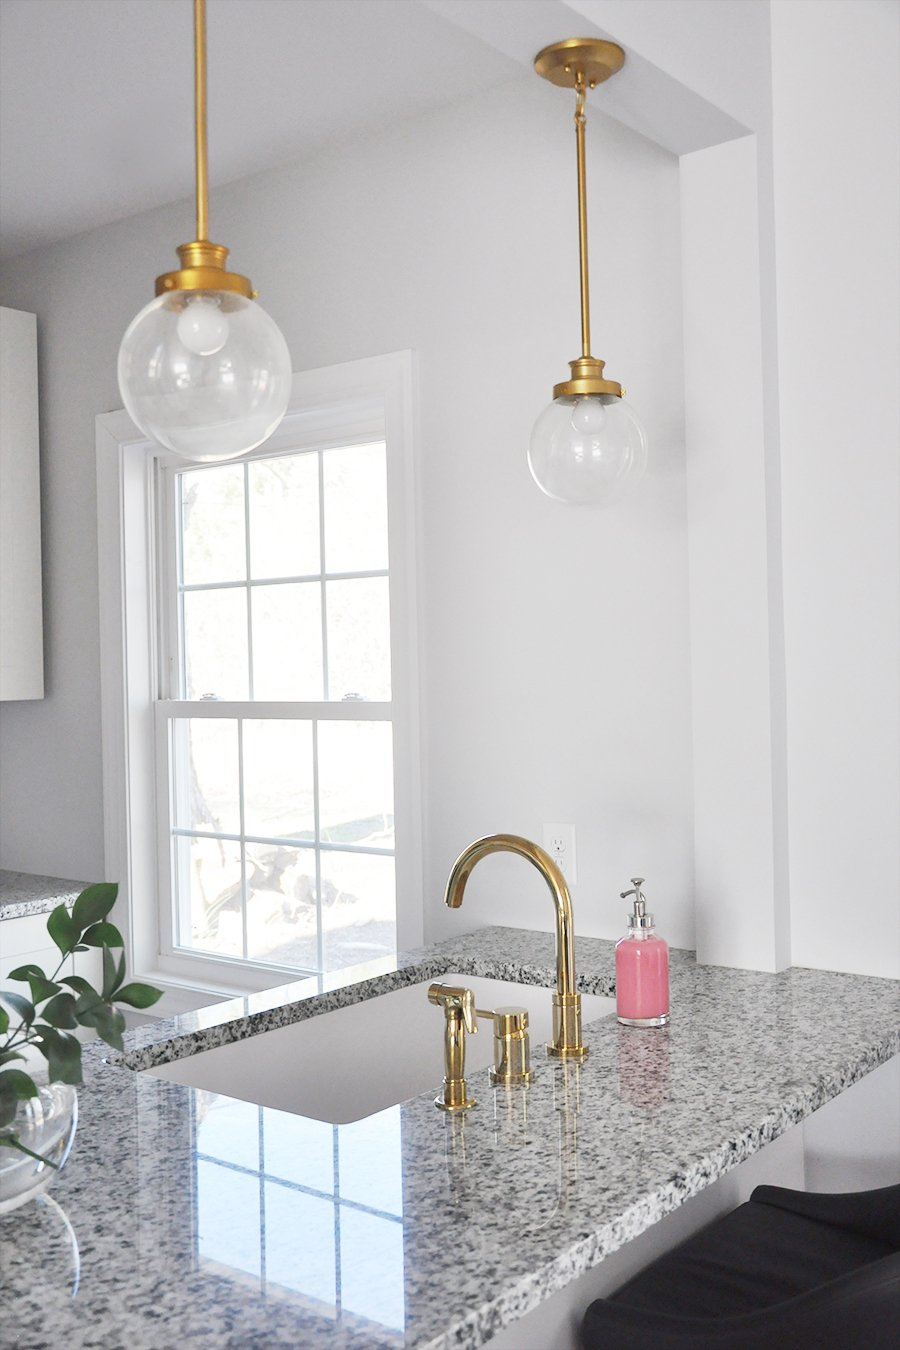 making the case for white undermount kitchen sinks white undermount kitchen sink Making the Case for White Undermount Kitchen Sinks